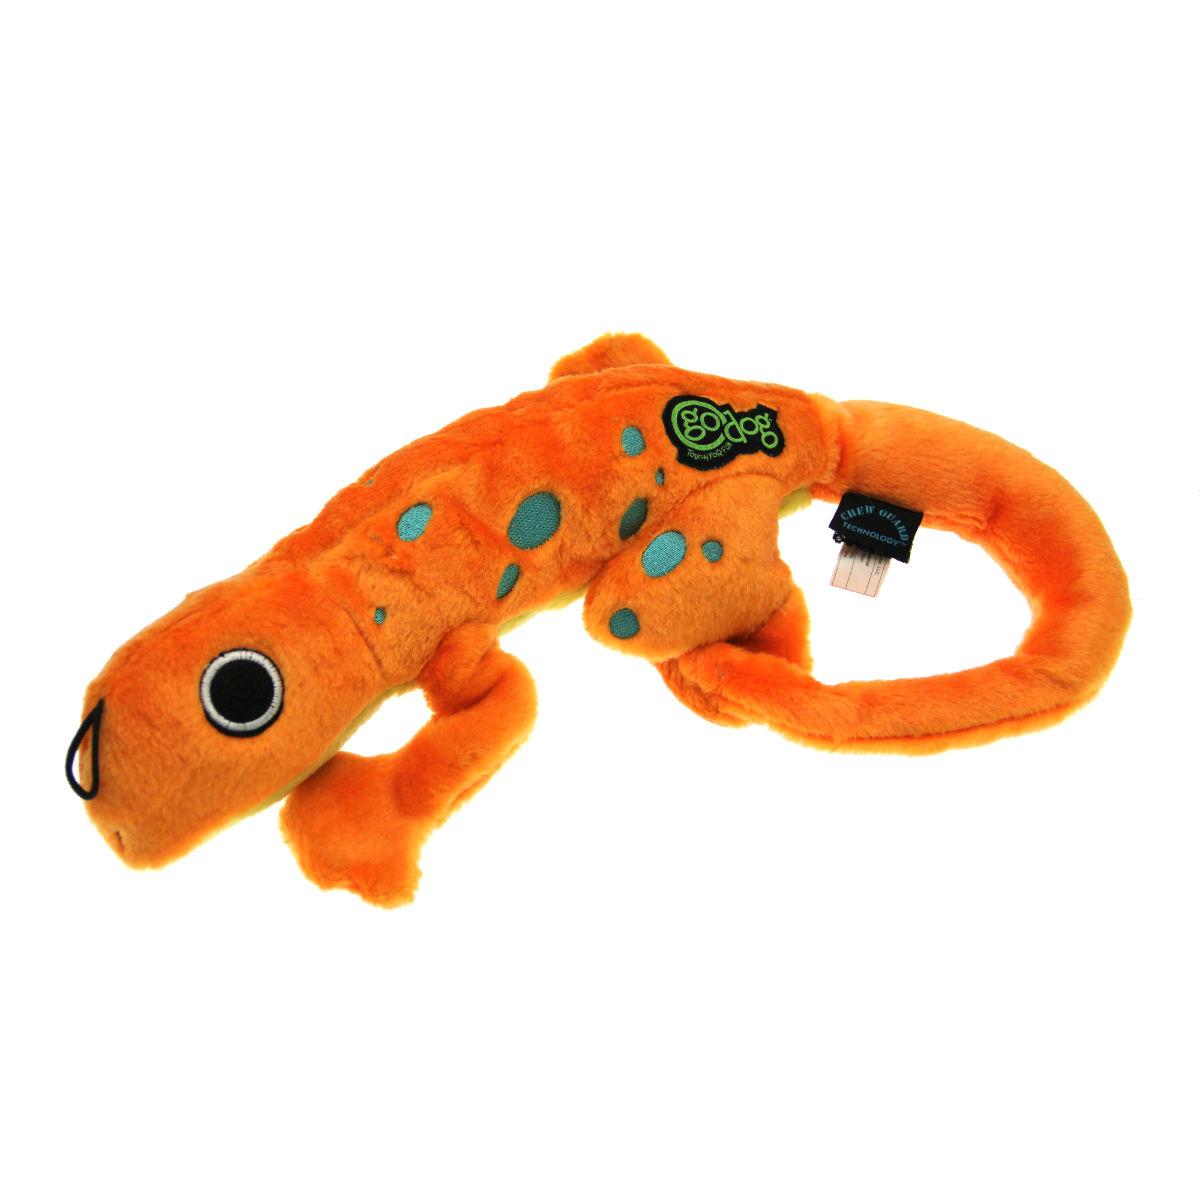 GoDog Amphibianz Salamander Dog Toy